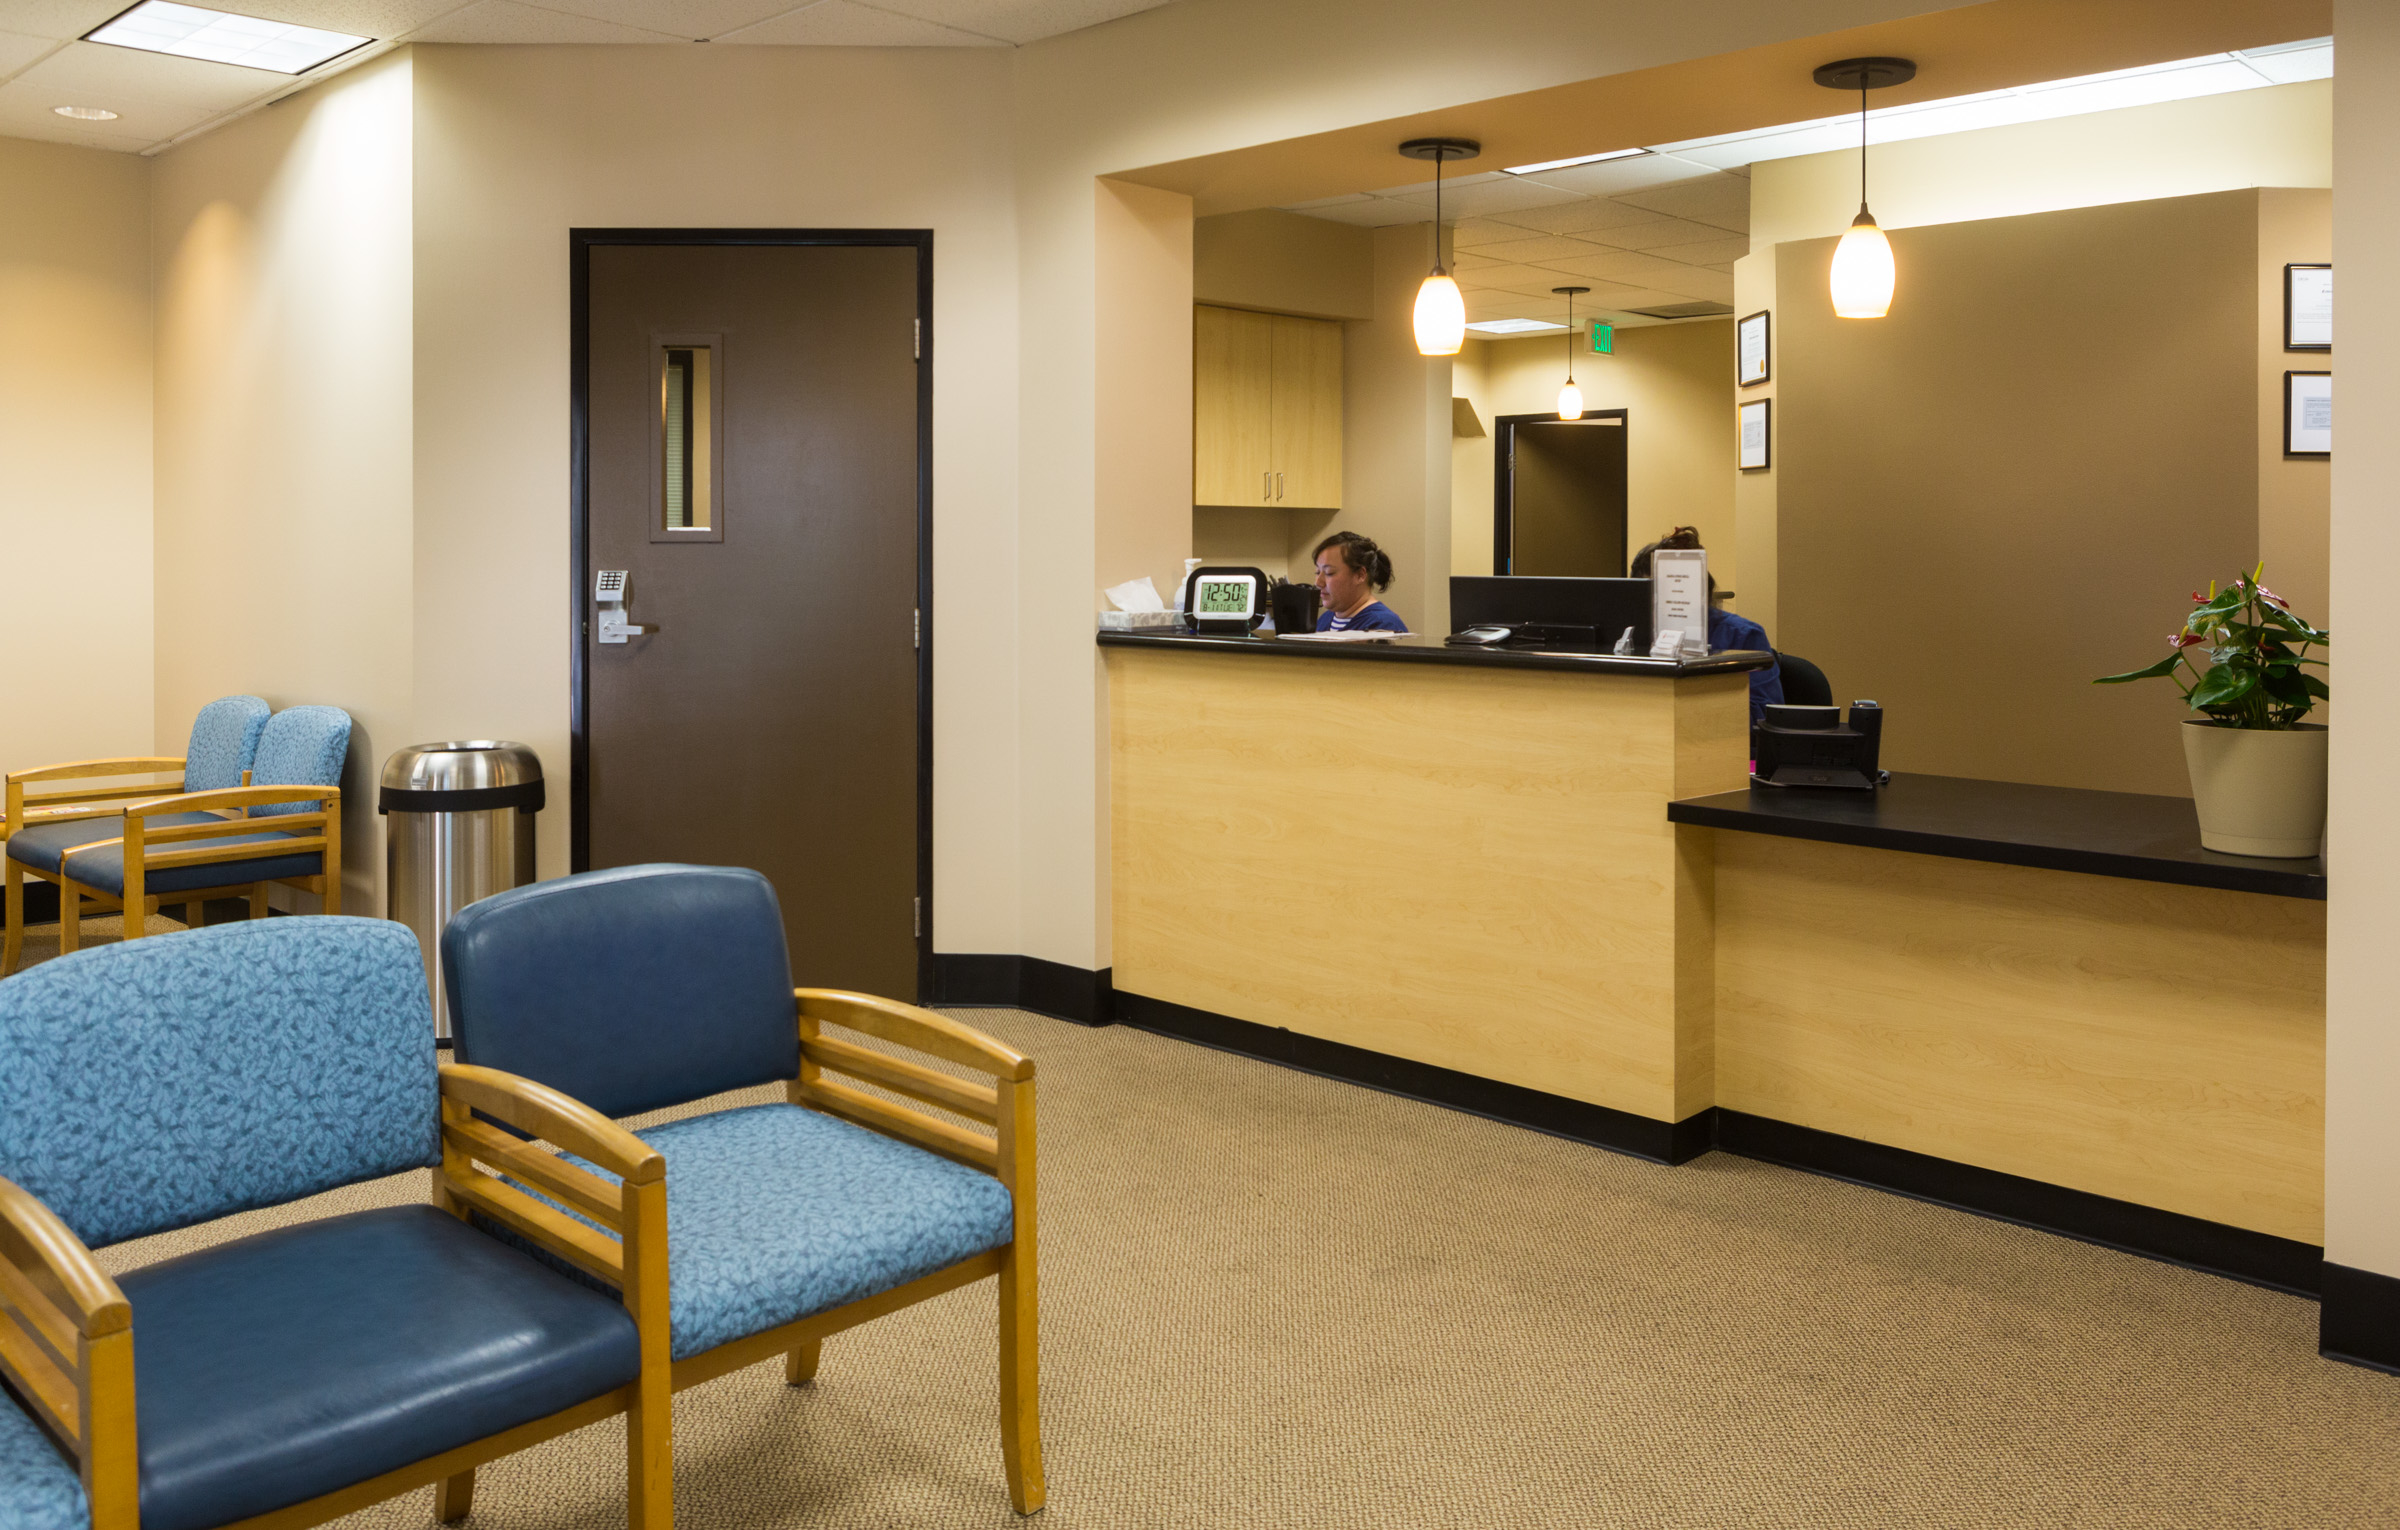 Camarosa Springs Medical Group image 4